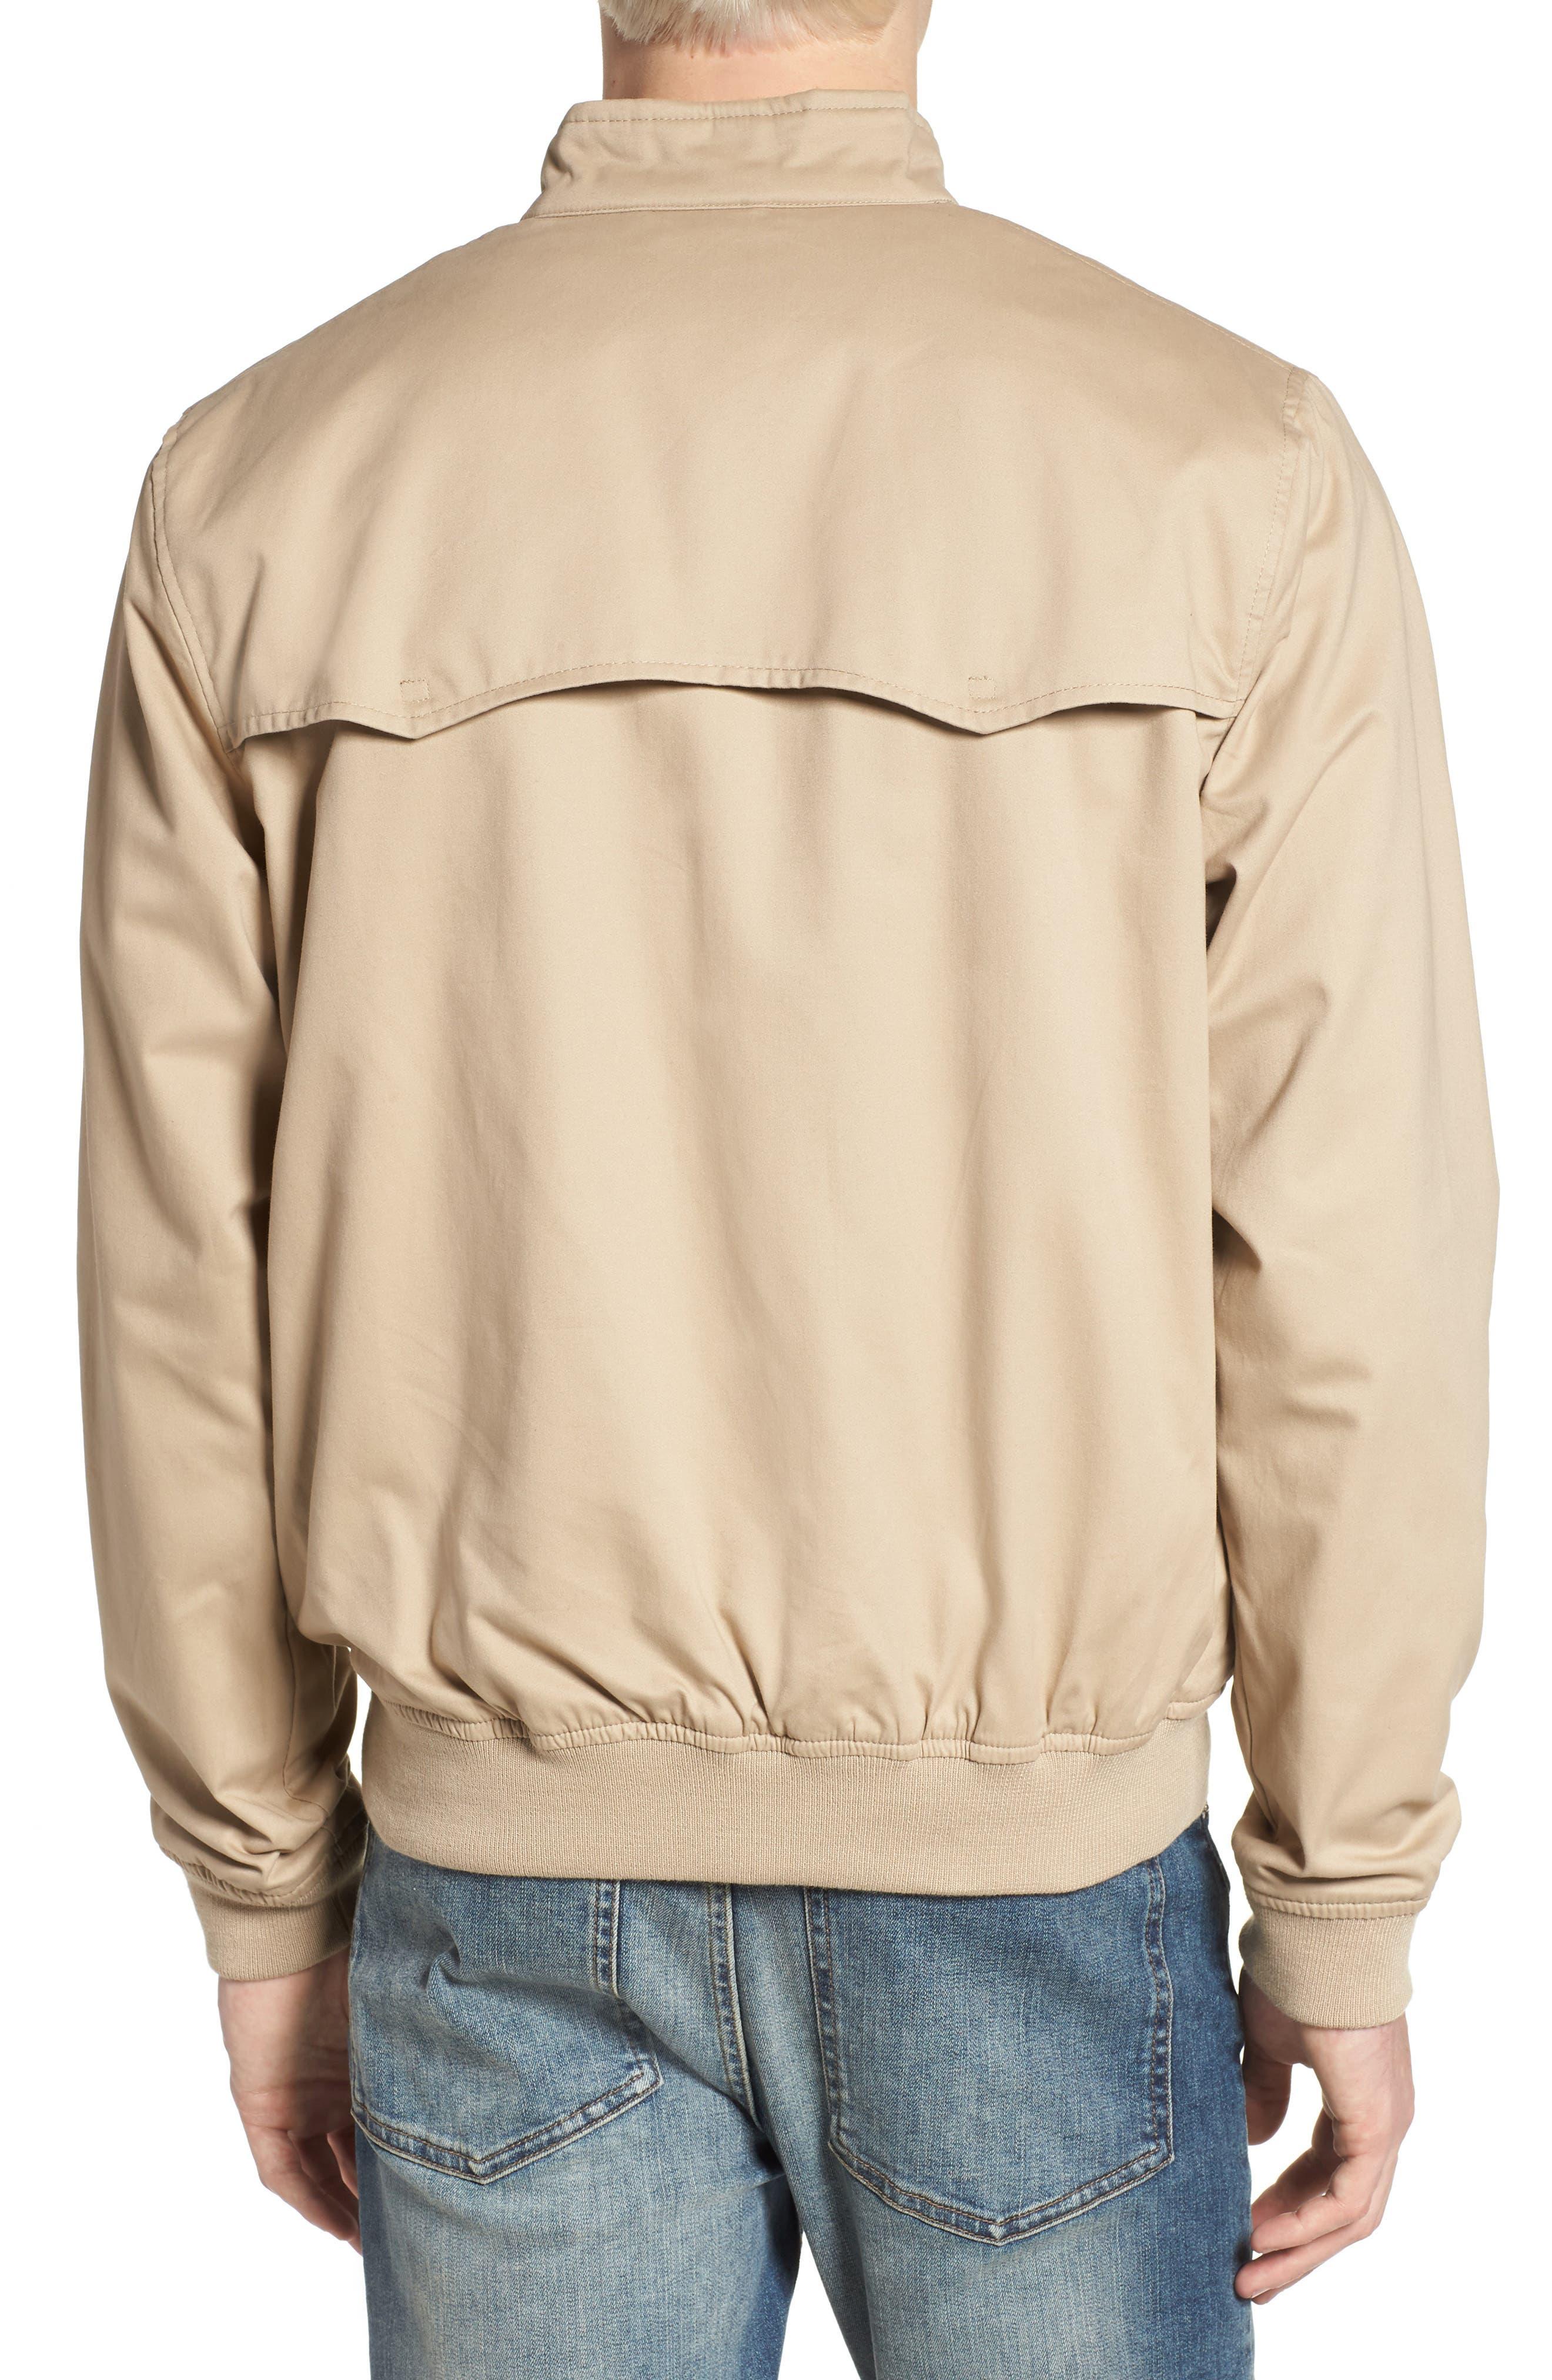 Harrington Jacket,                             Alternate thumbnail 2, color,                             Stone